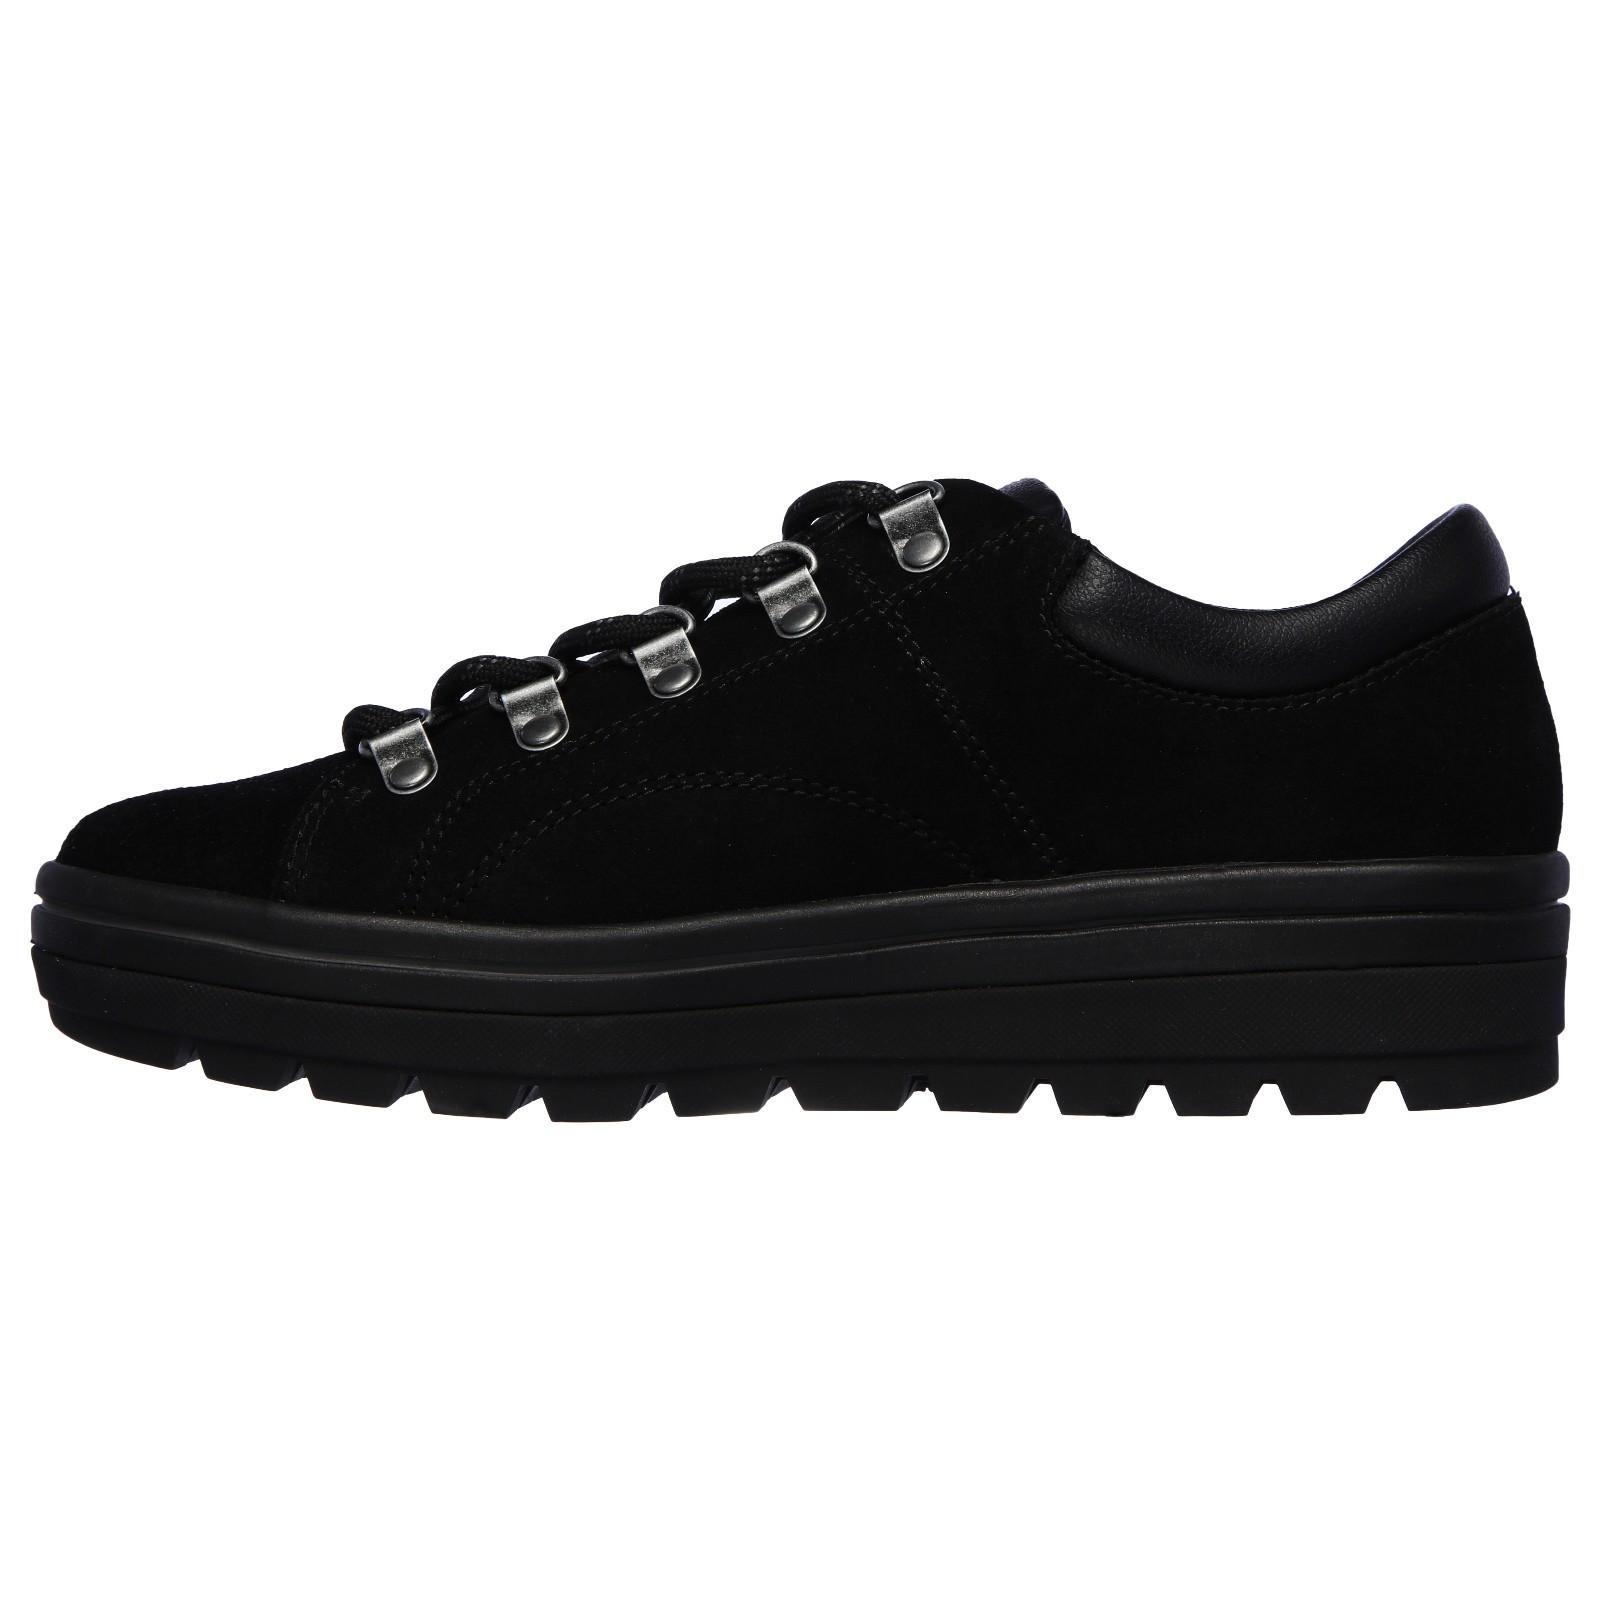 Skechers női fűzős cipő 74107 BBK Street Cleats2 Fashion